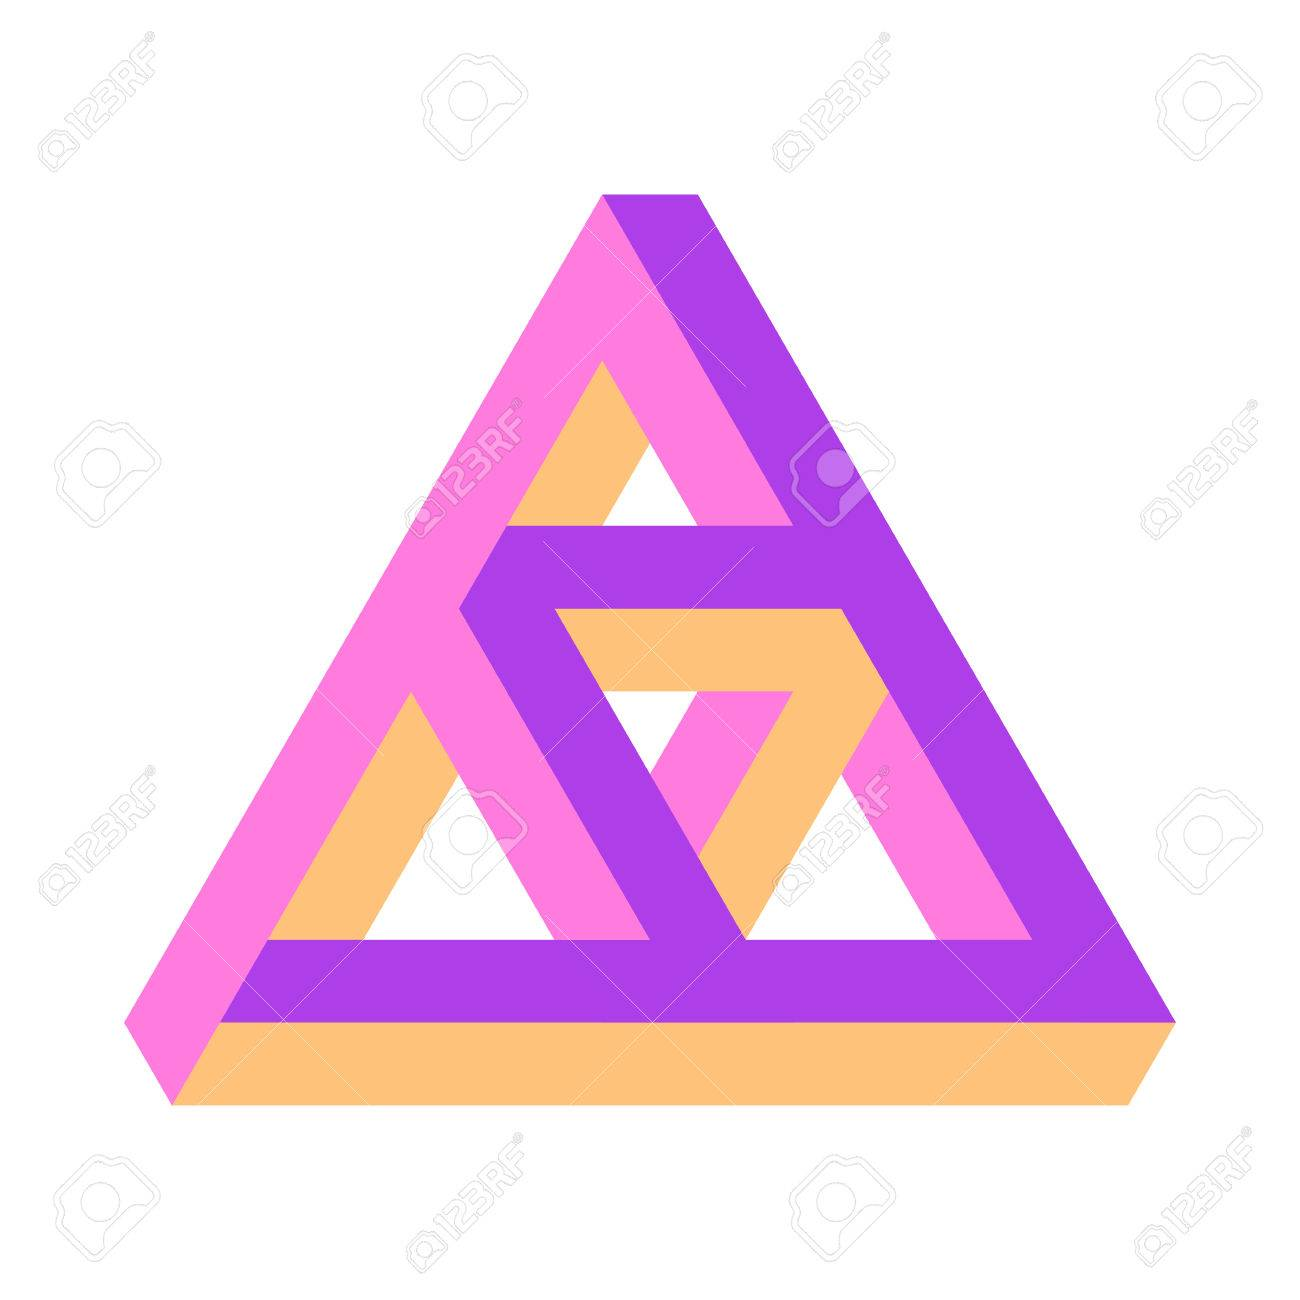 Vector Illustration Of The Penrose Triangle Penrose Triforce